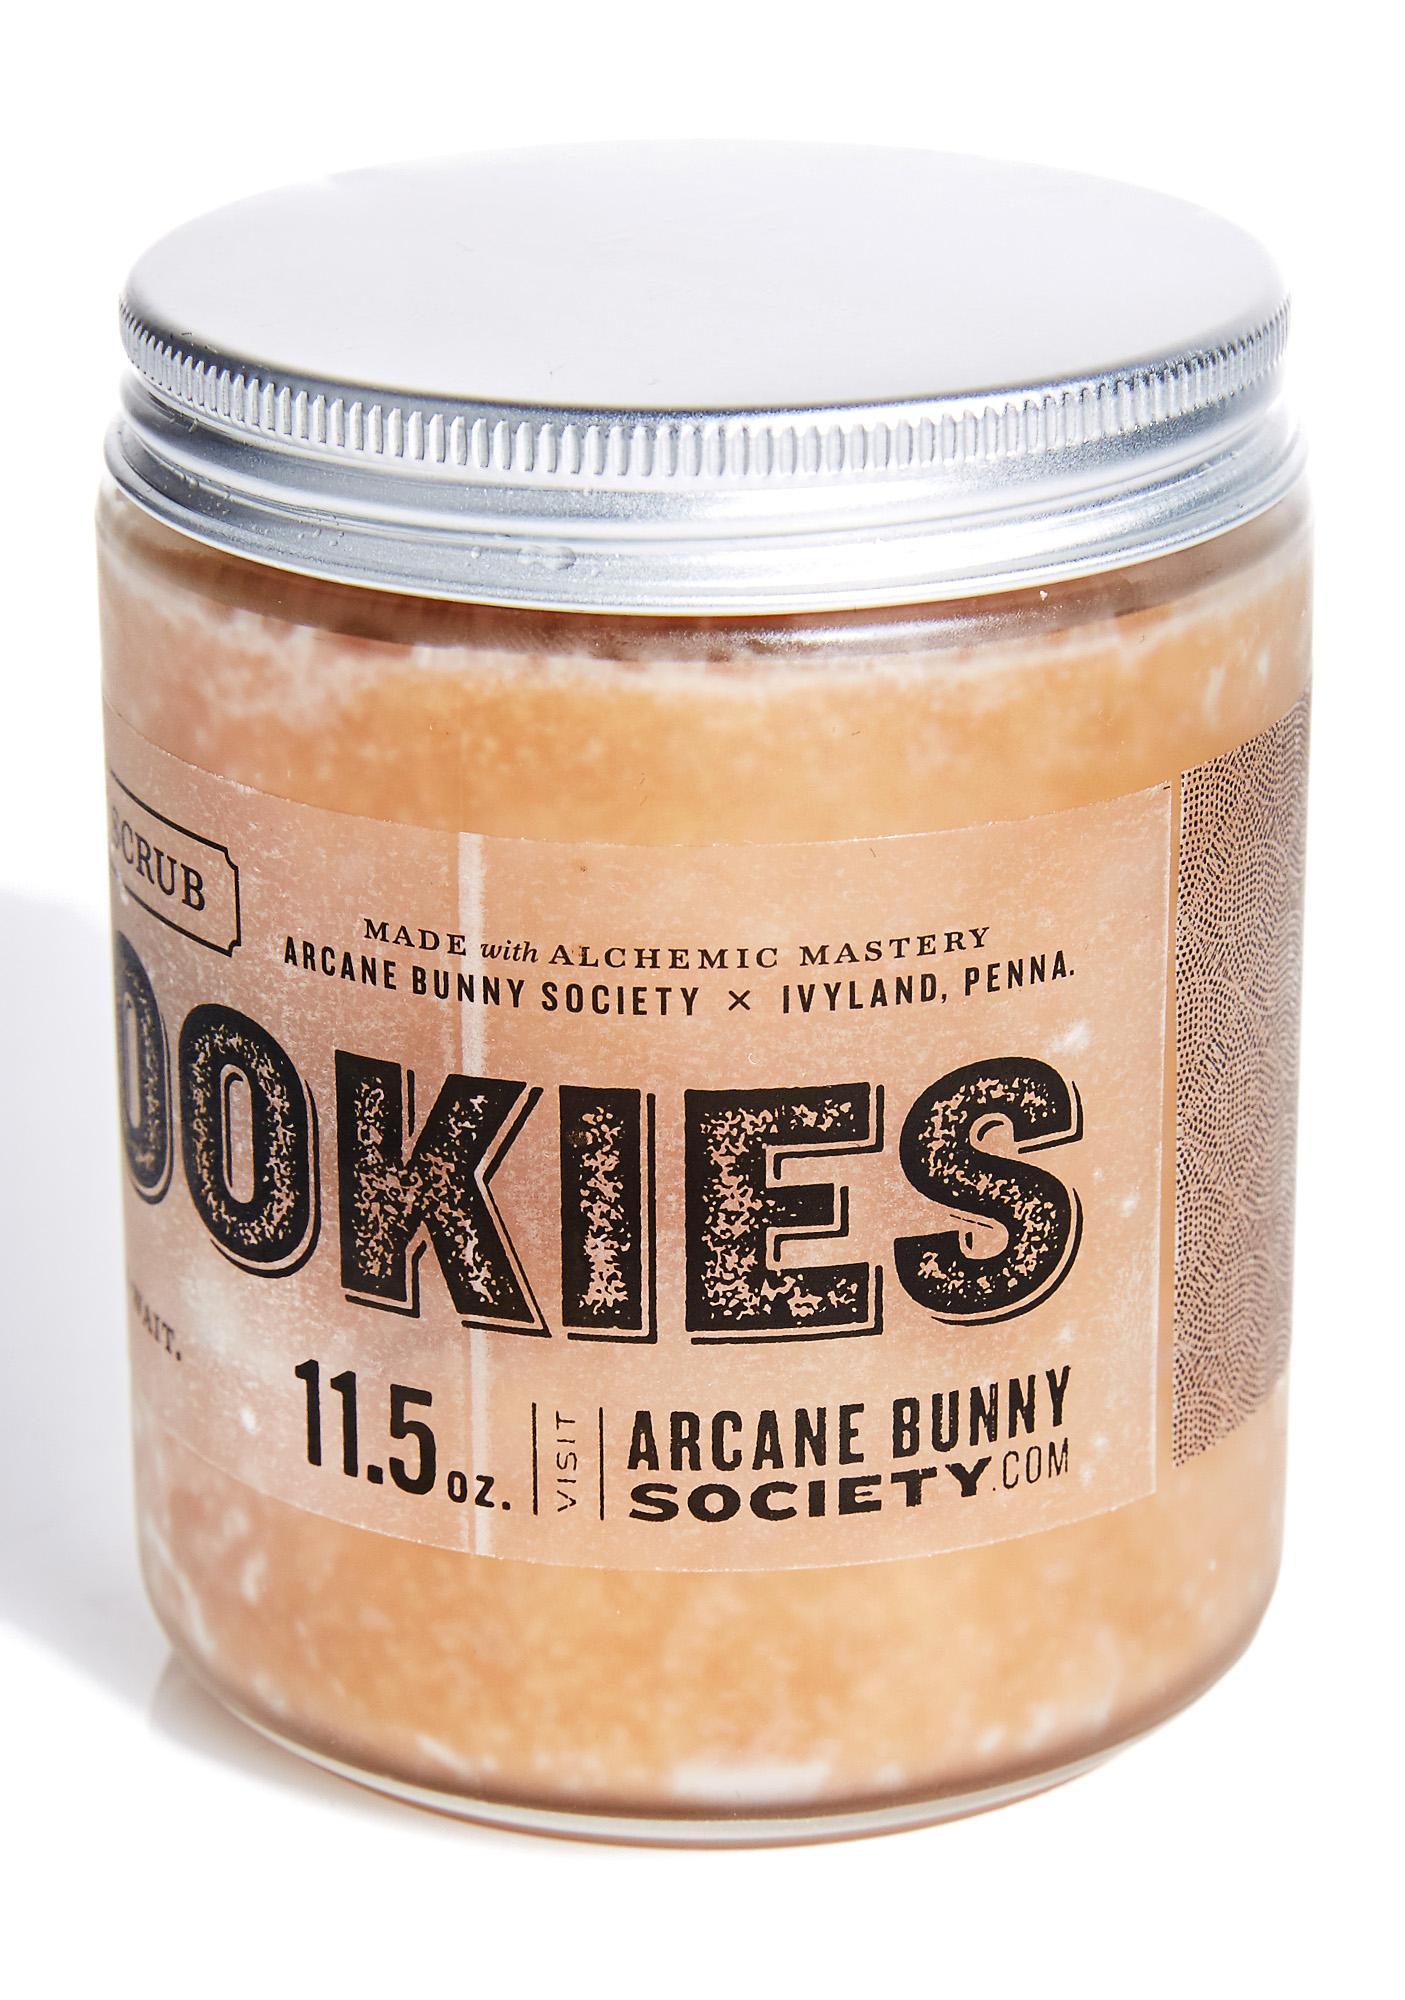 Arcane Bunny Society I'm Cookies Sugar Scrub